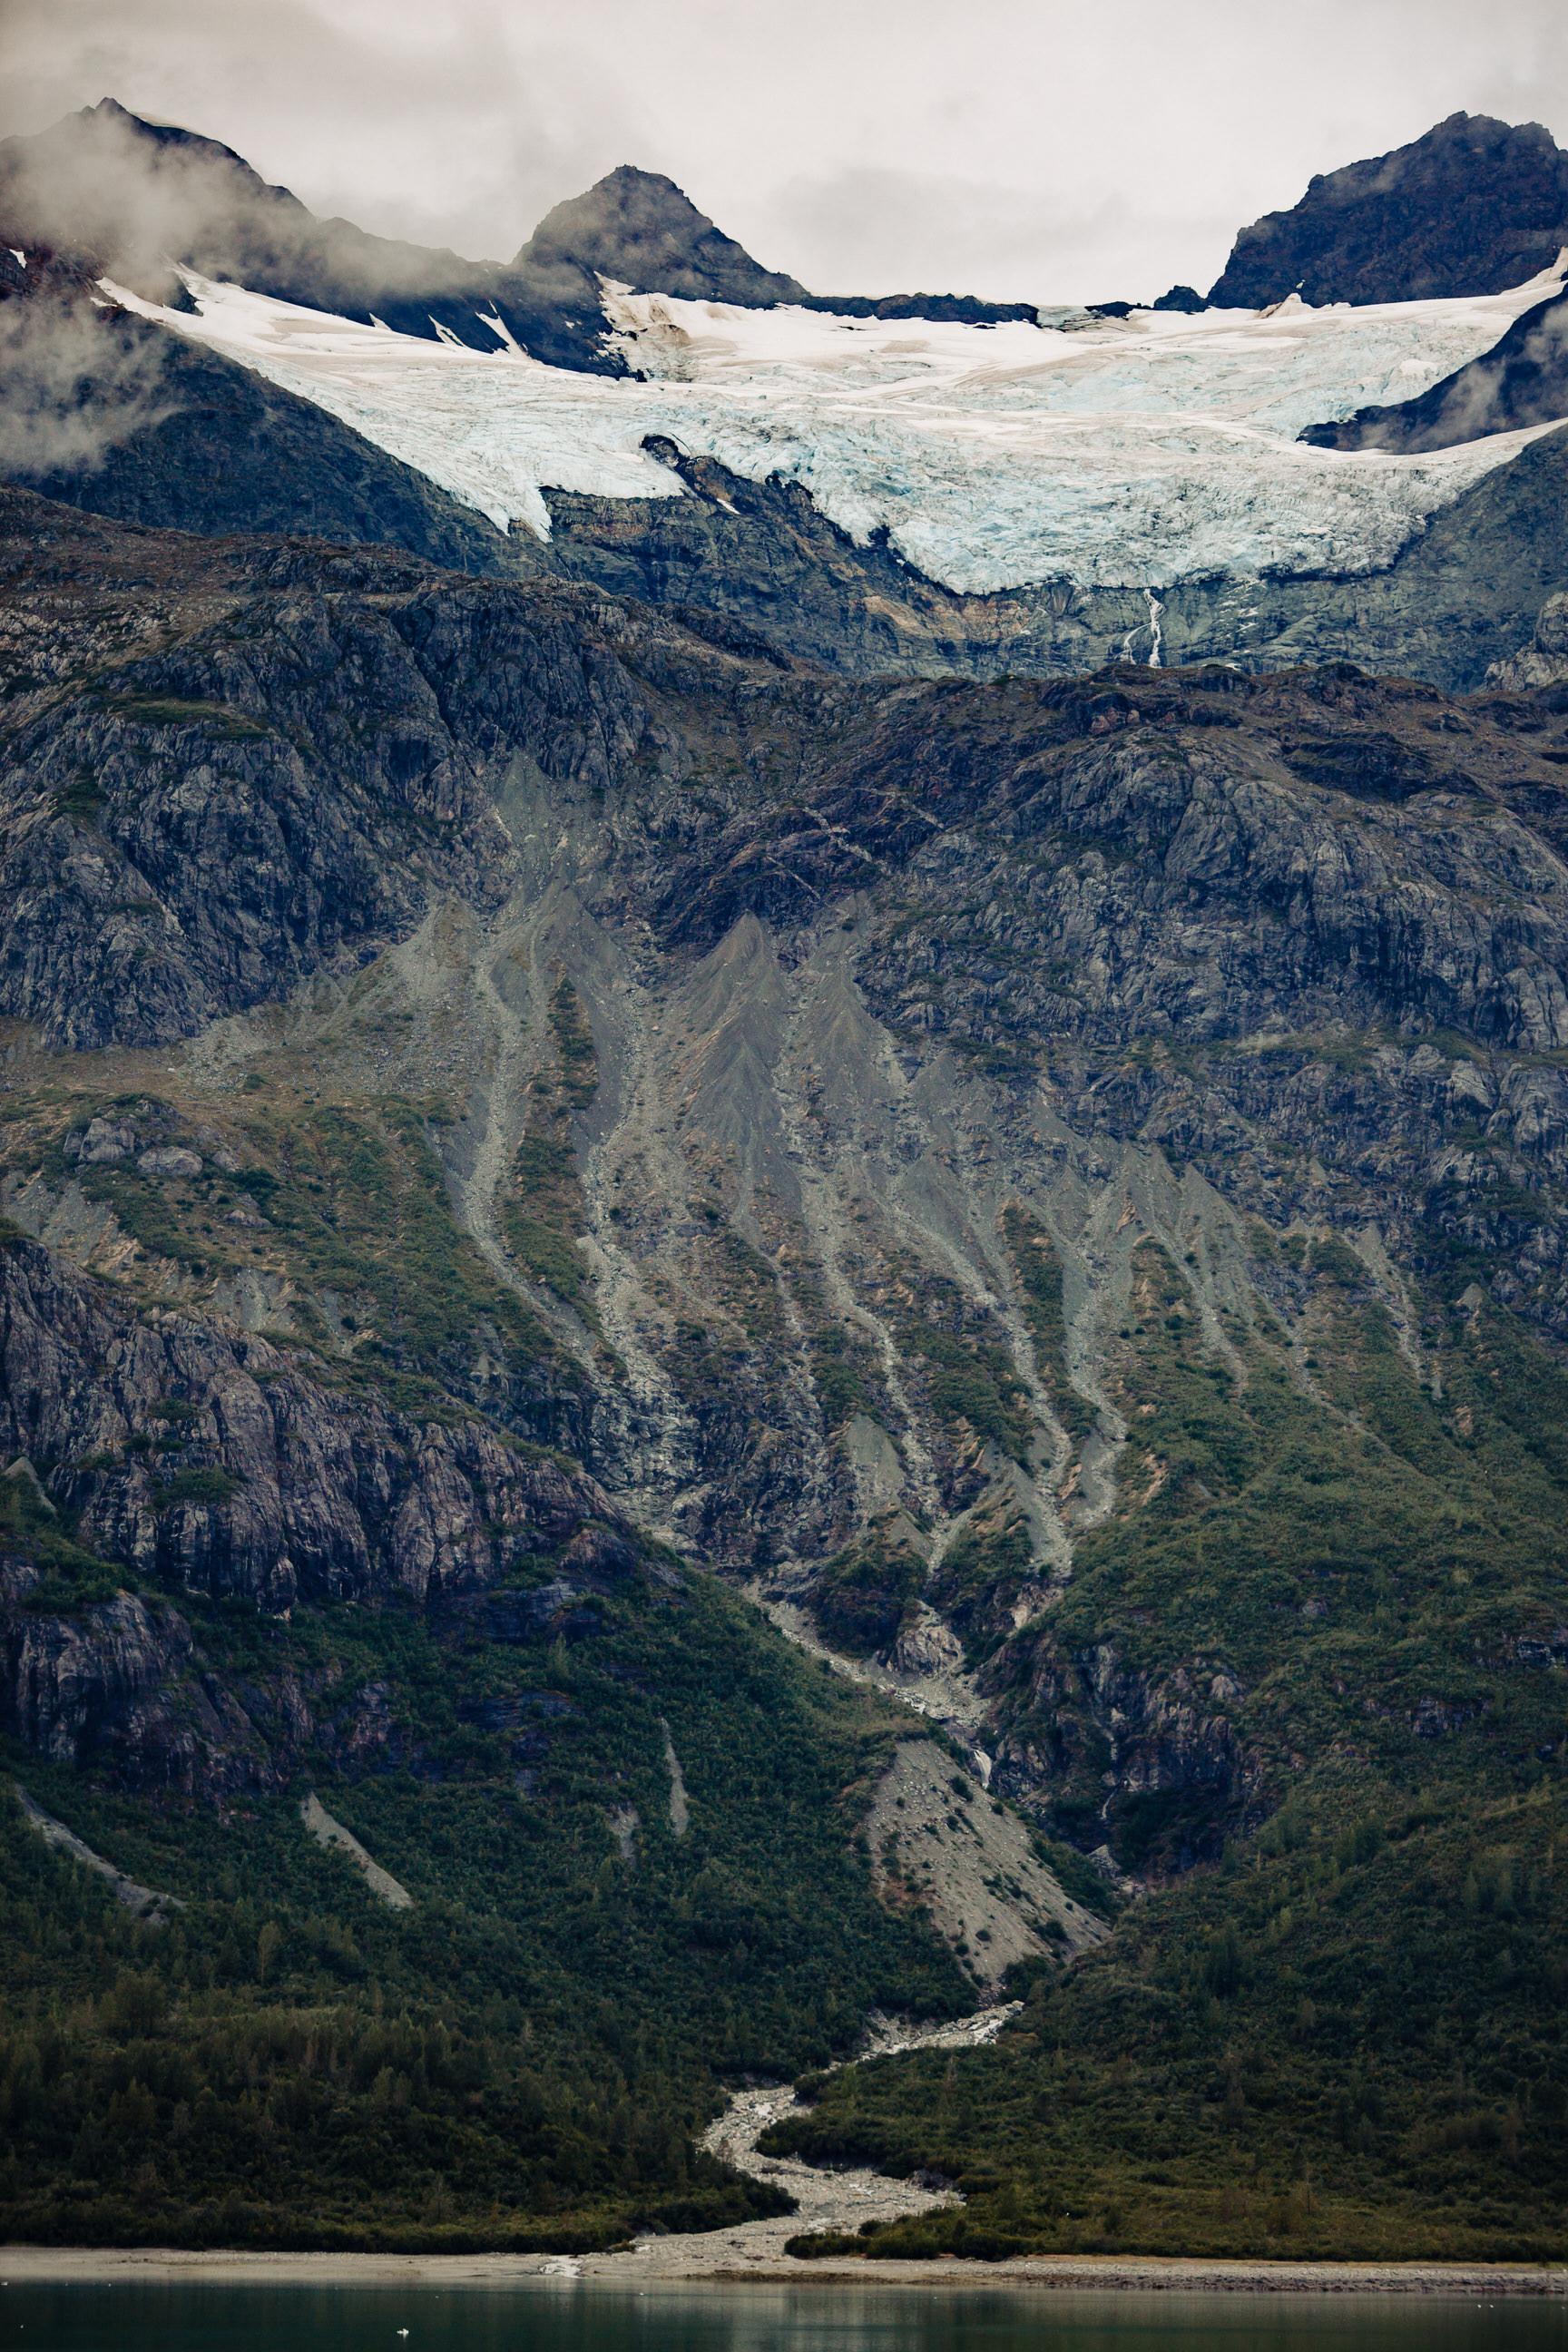 beautiful_mountains_glaciers_glacier_bay_tiny_house_photo_travel_adventures-1.jpg